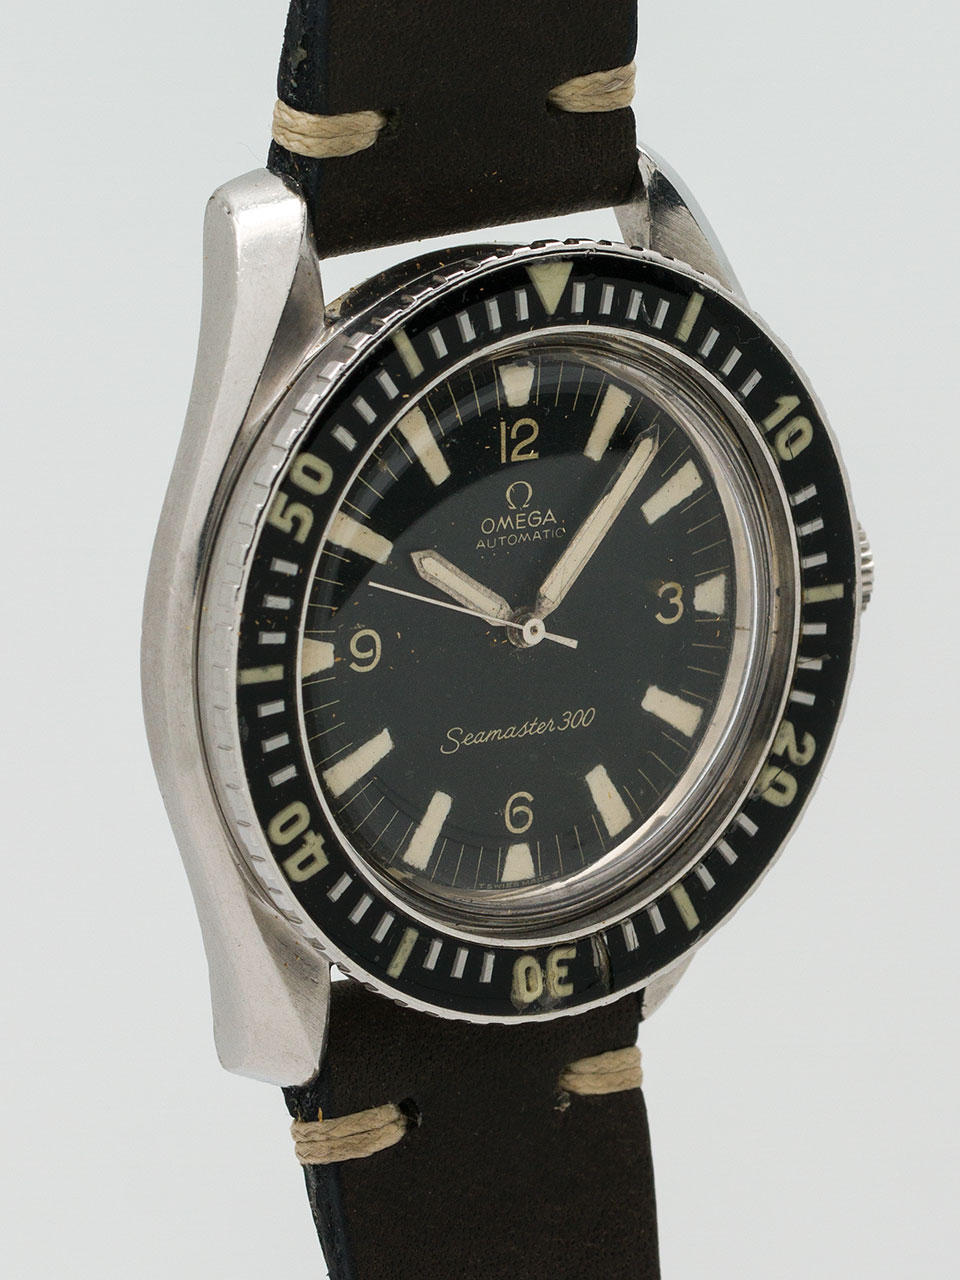 Omega SS Seamaster 300 circa 1964